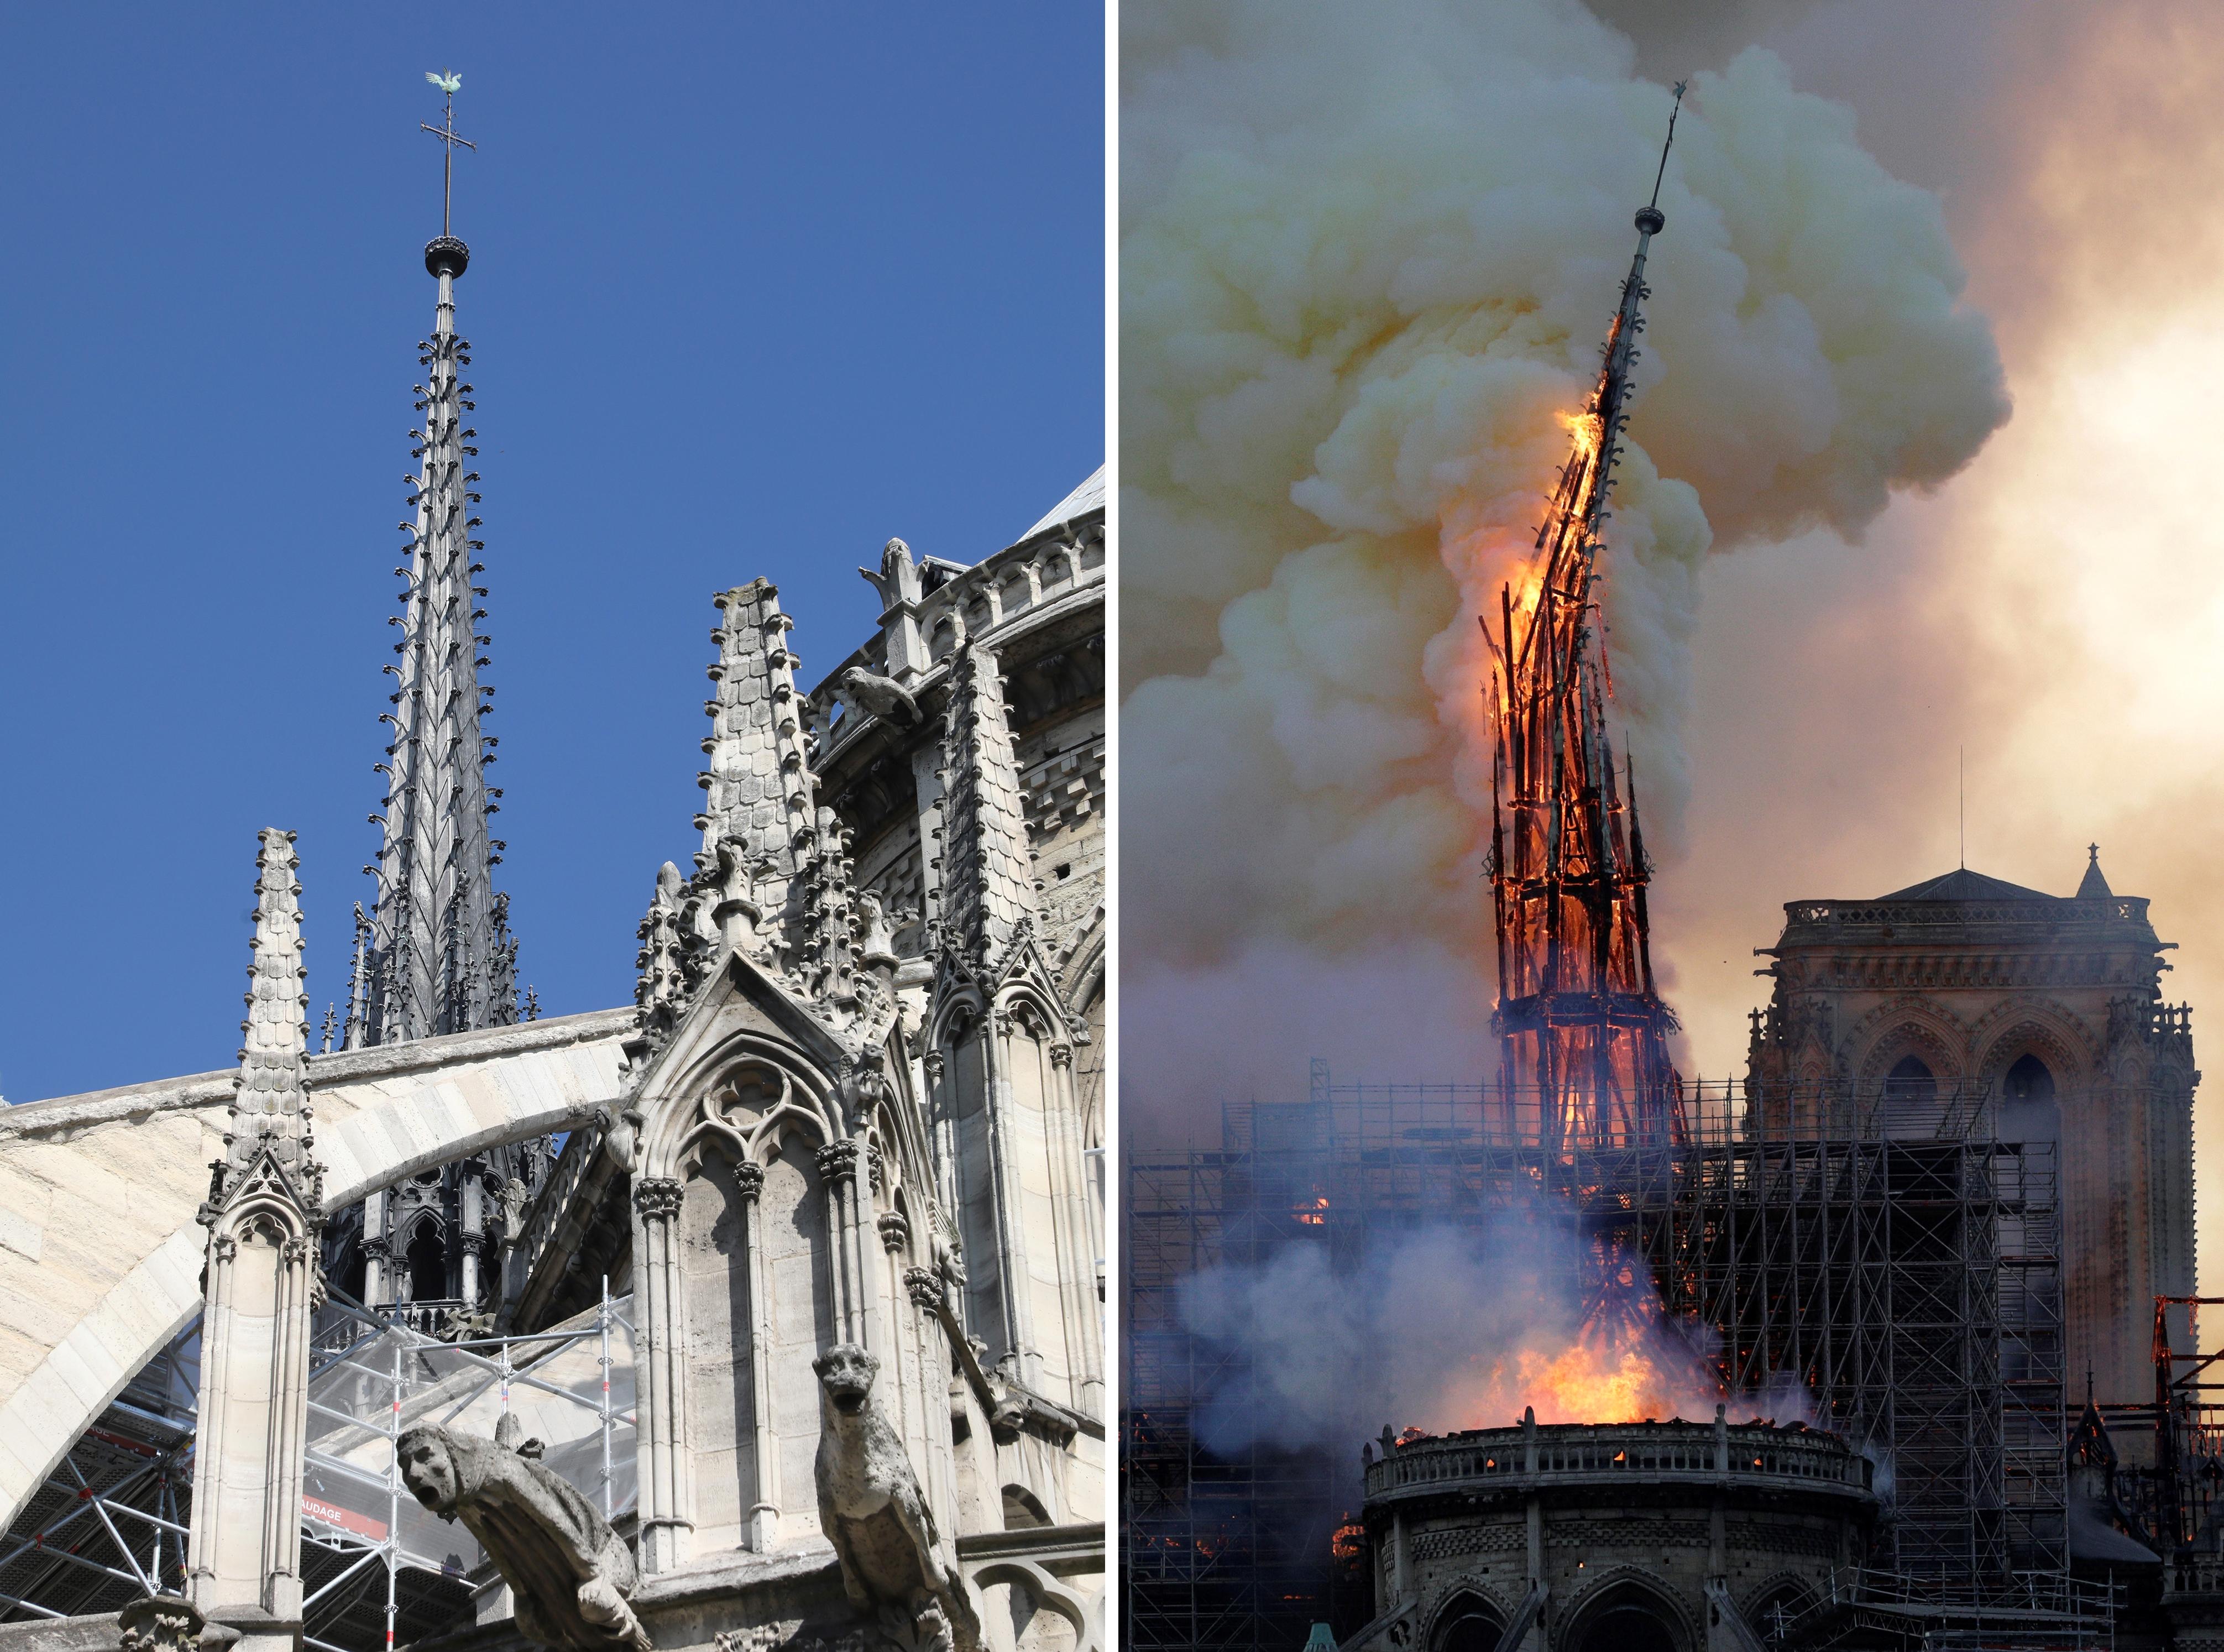 Un ya antes y tras la aguja (Photo by Ludovic MARIN and Geoffroy VAN DER HASSELT / AFP)